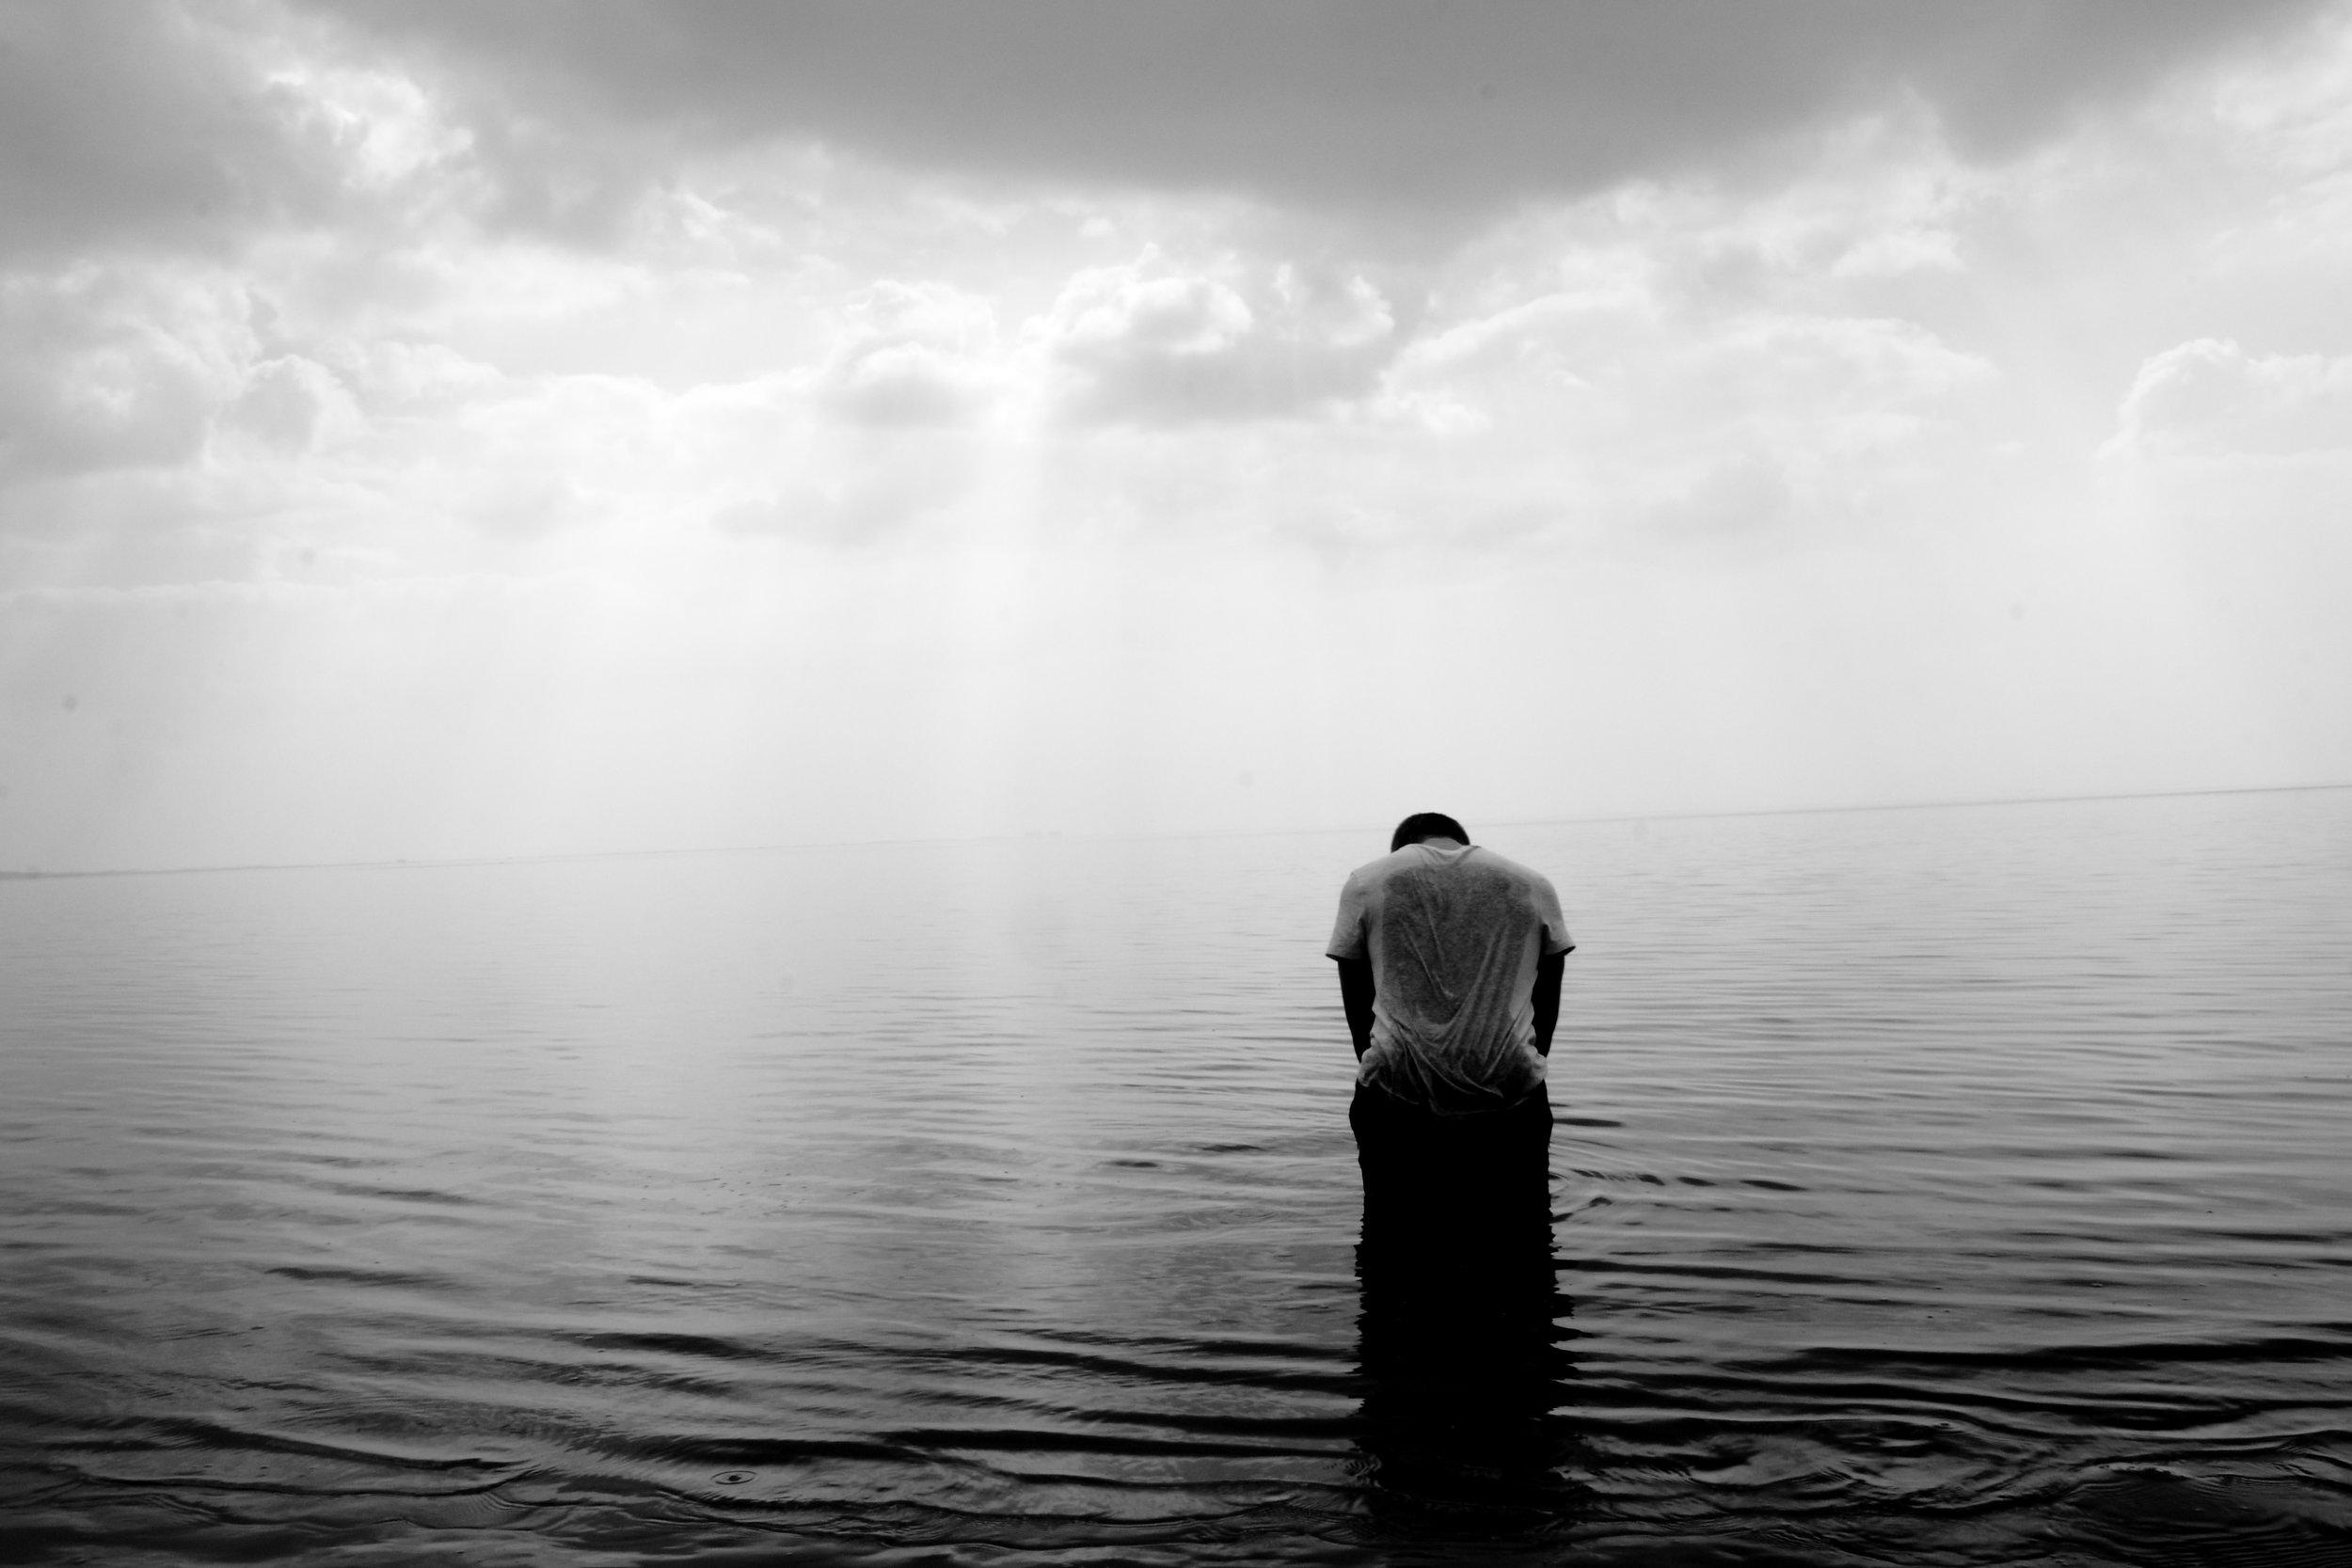 Deeply held beliefs can leave us feeling flawed